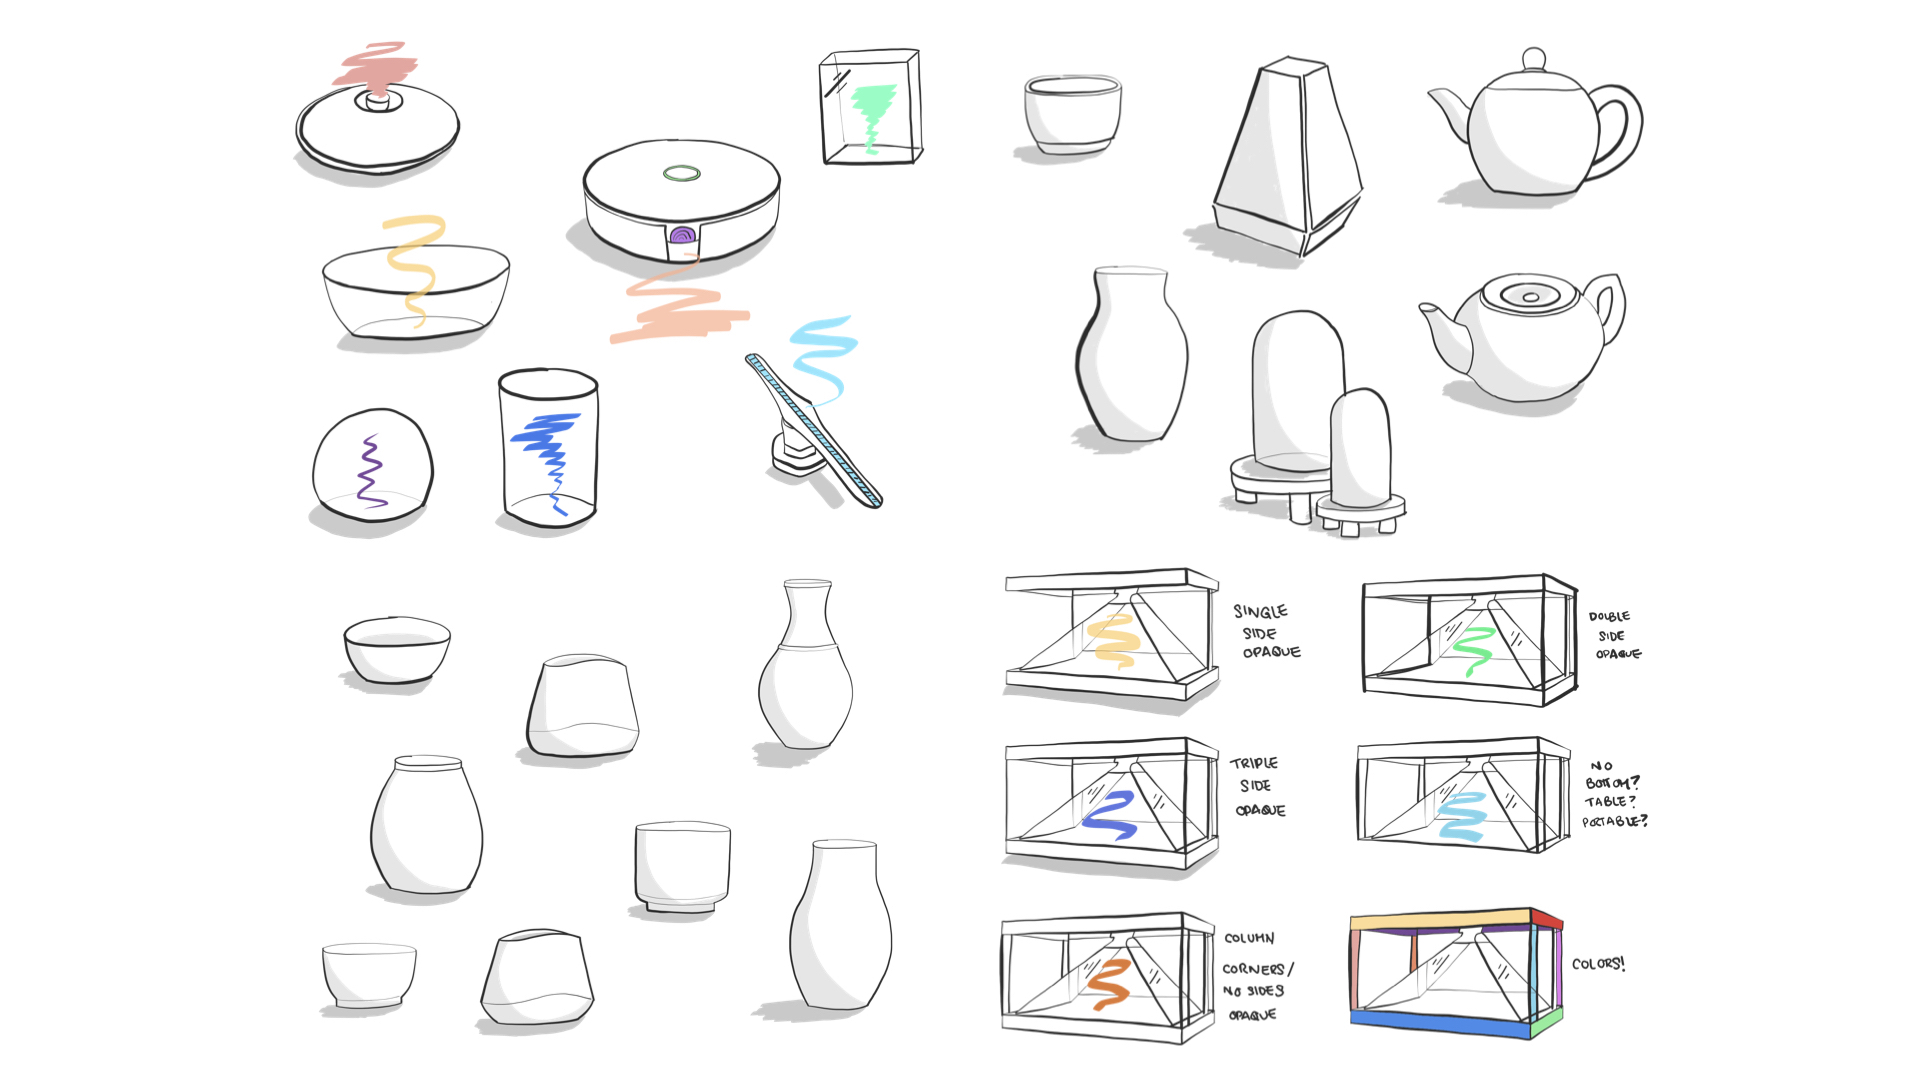 009_affie-sketches.jpeg